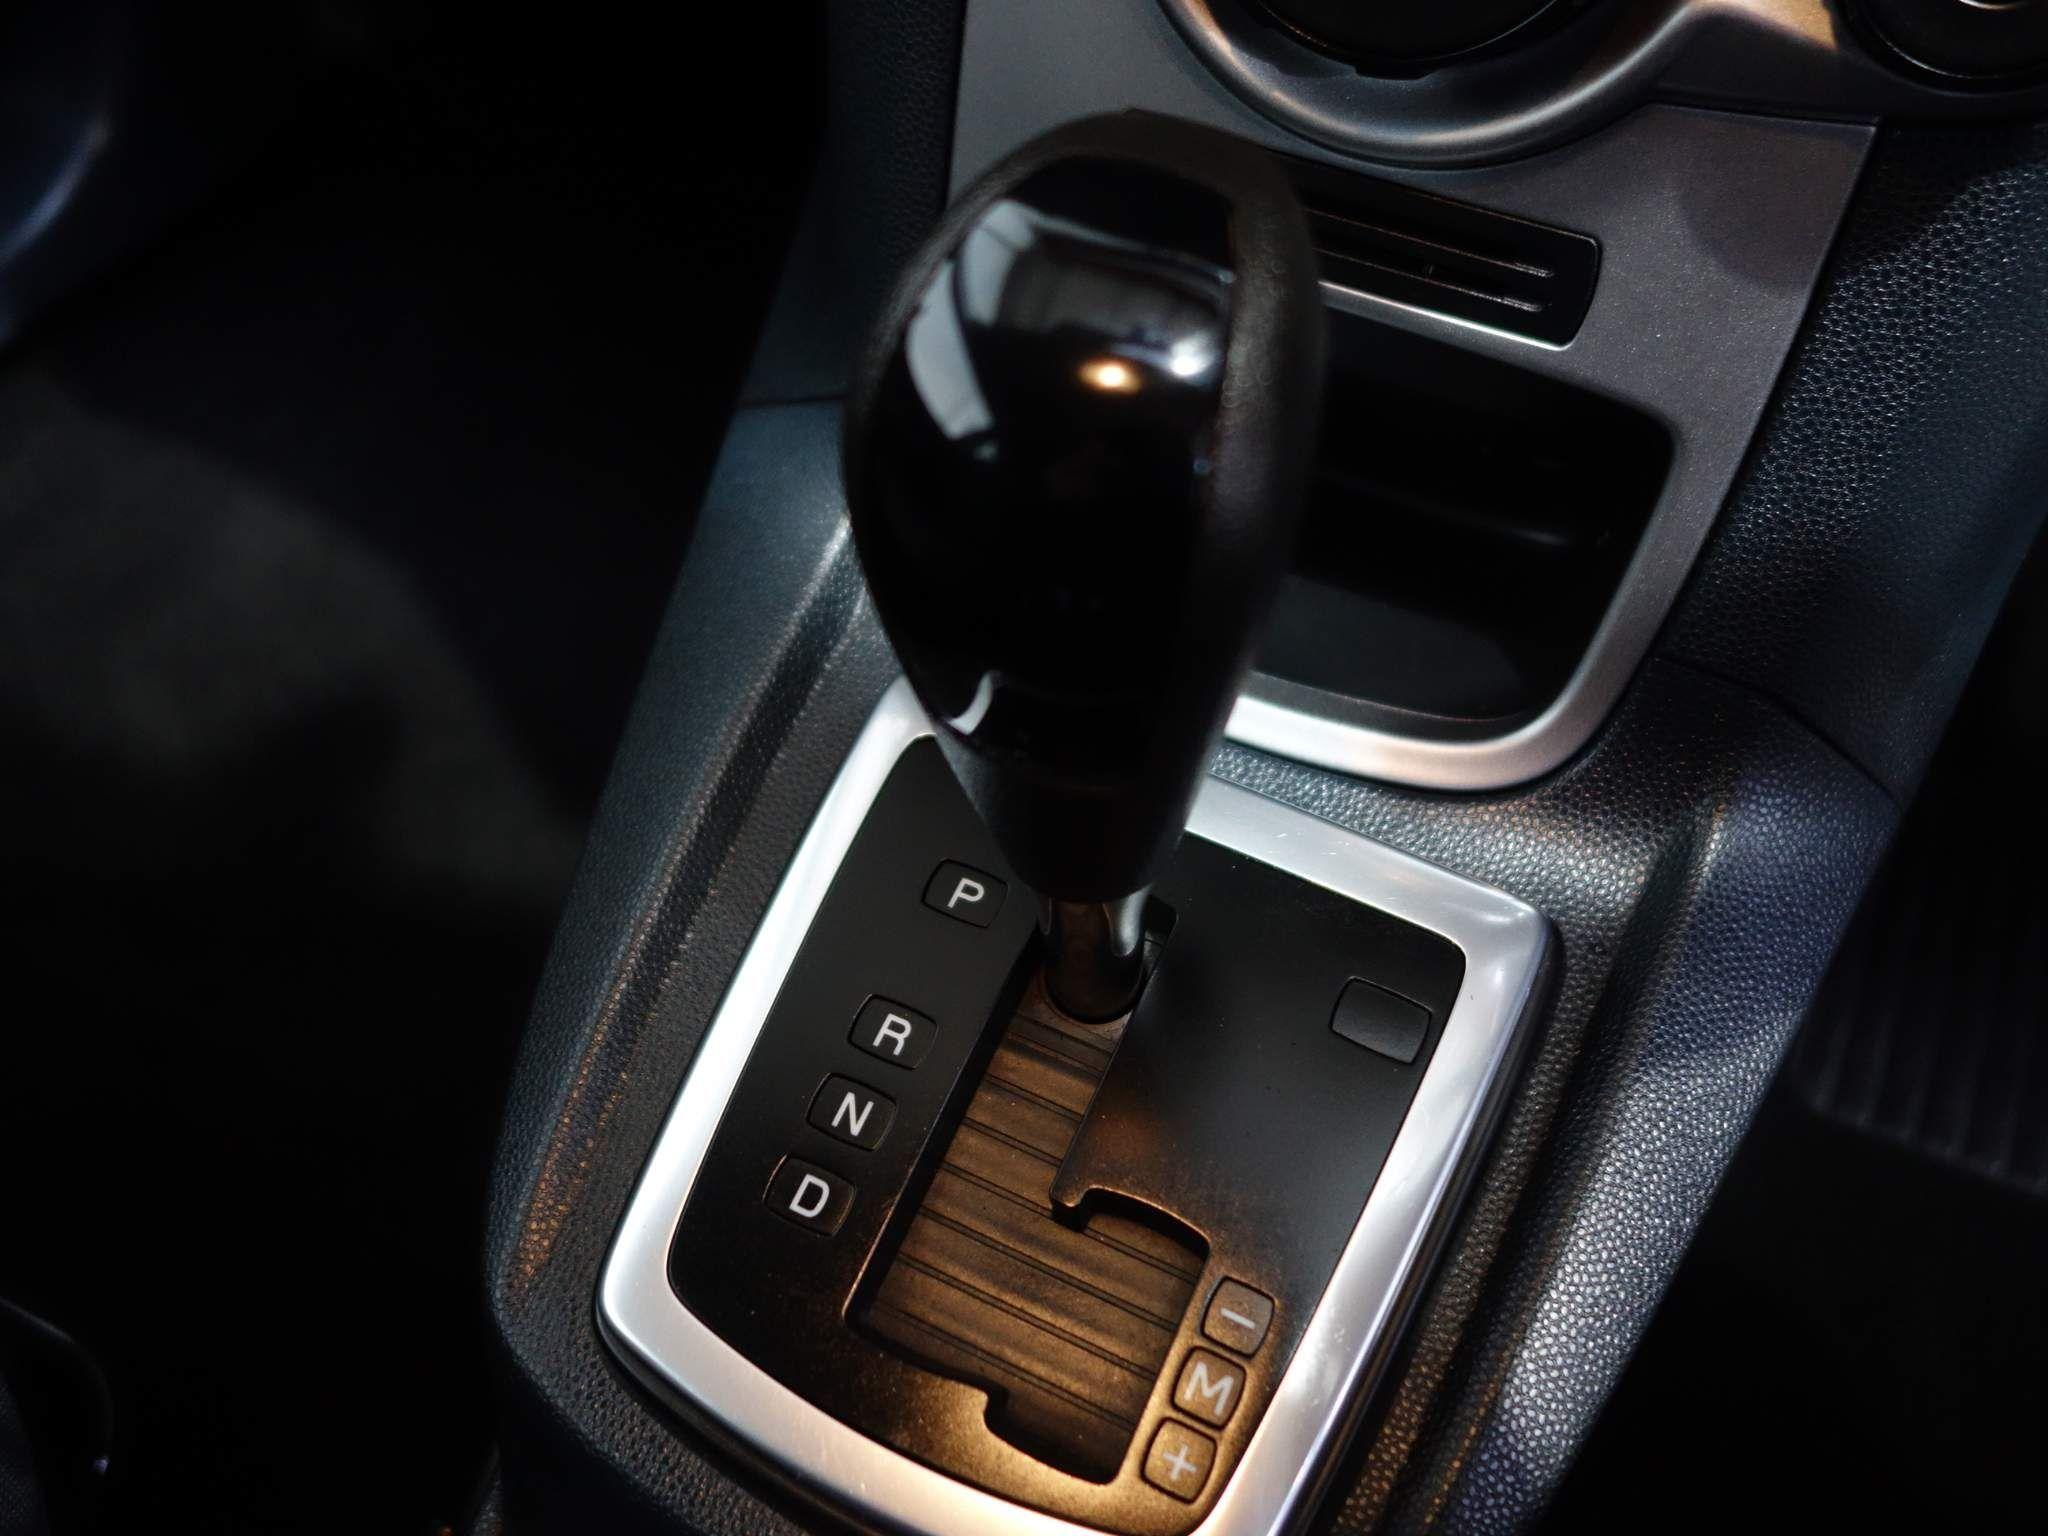 Ford Fiesta 1.4 Edge 3dr – EO59GWJ